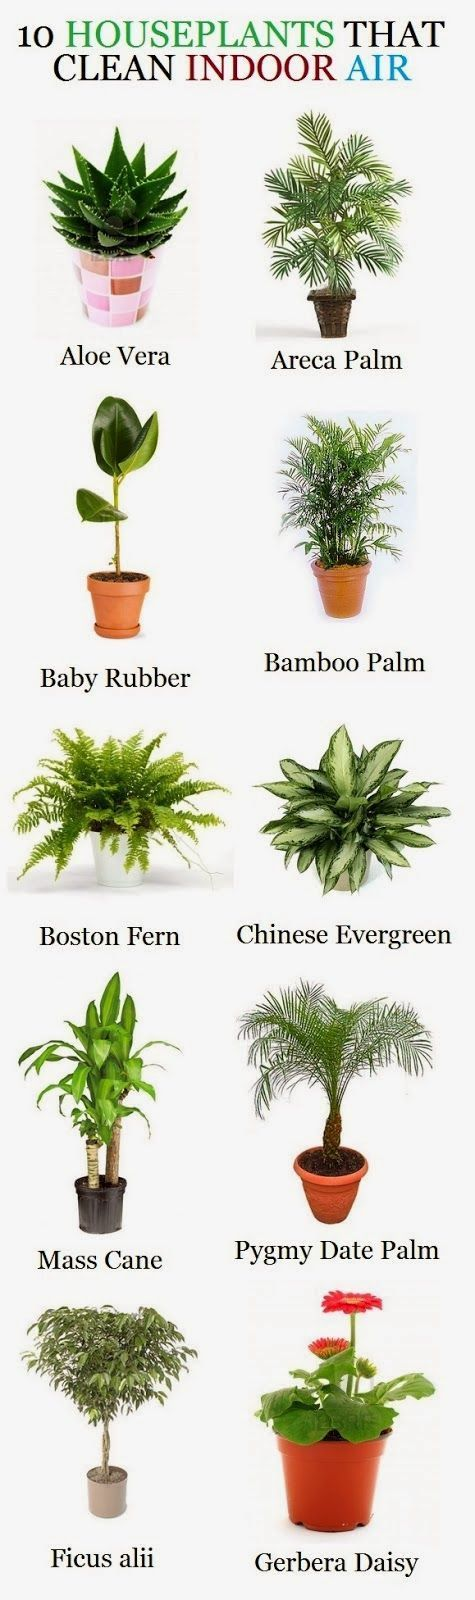 69805862948577058 10 Houseplants that clean indoor air